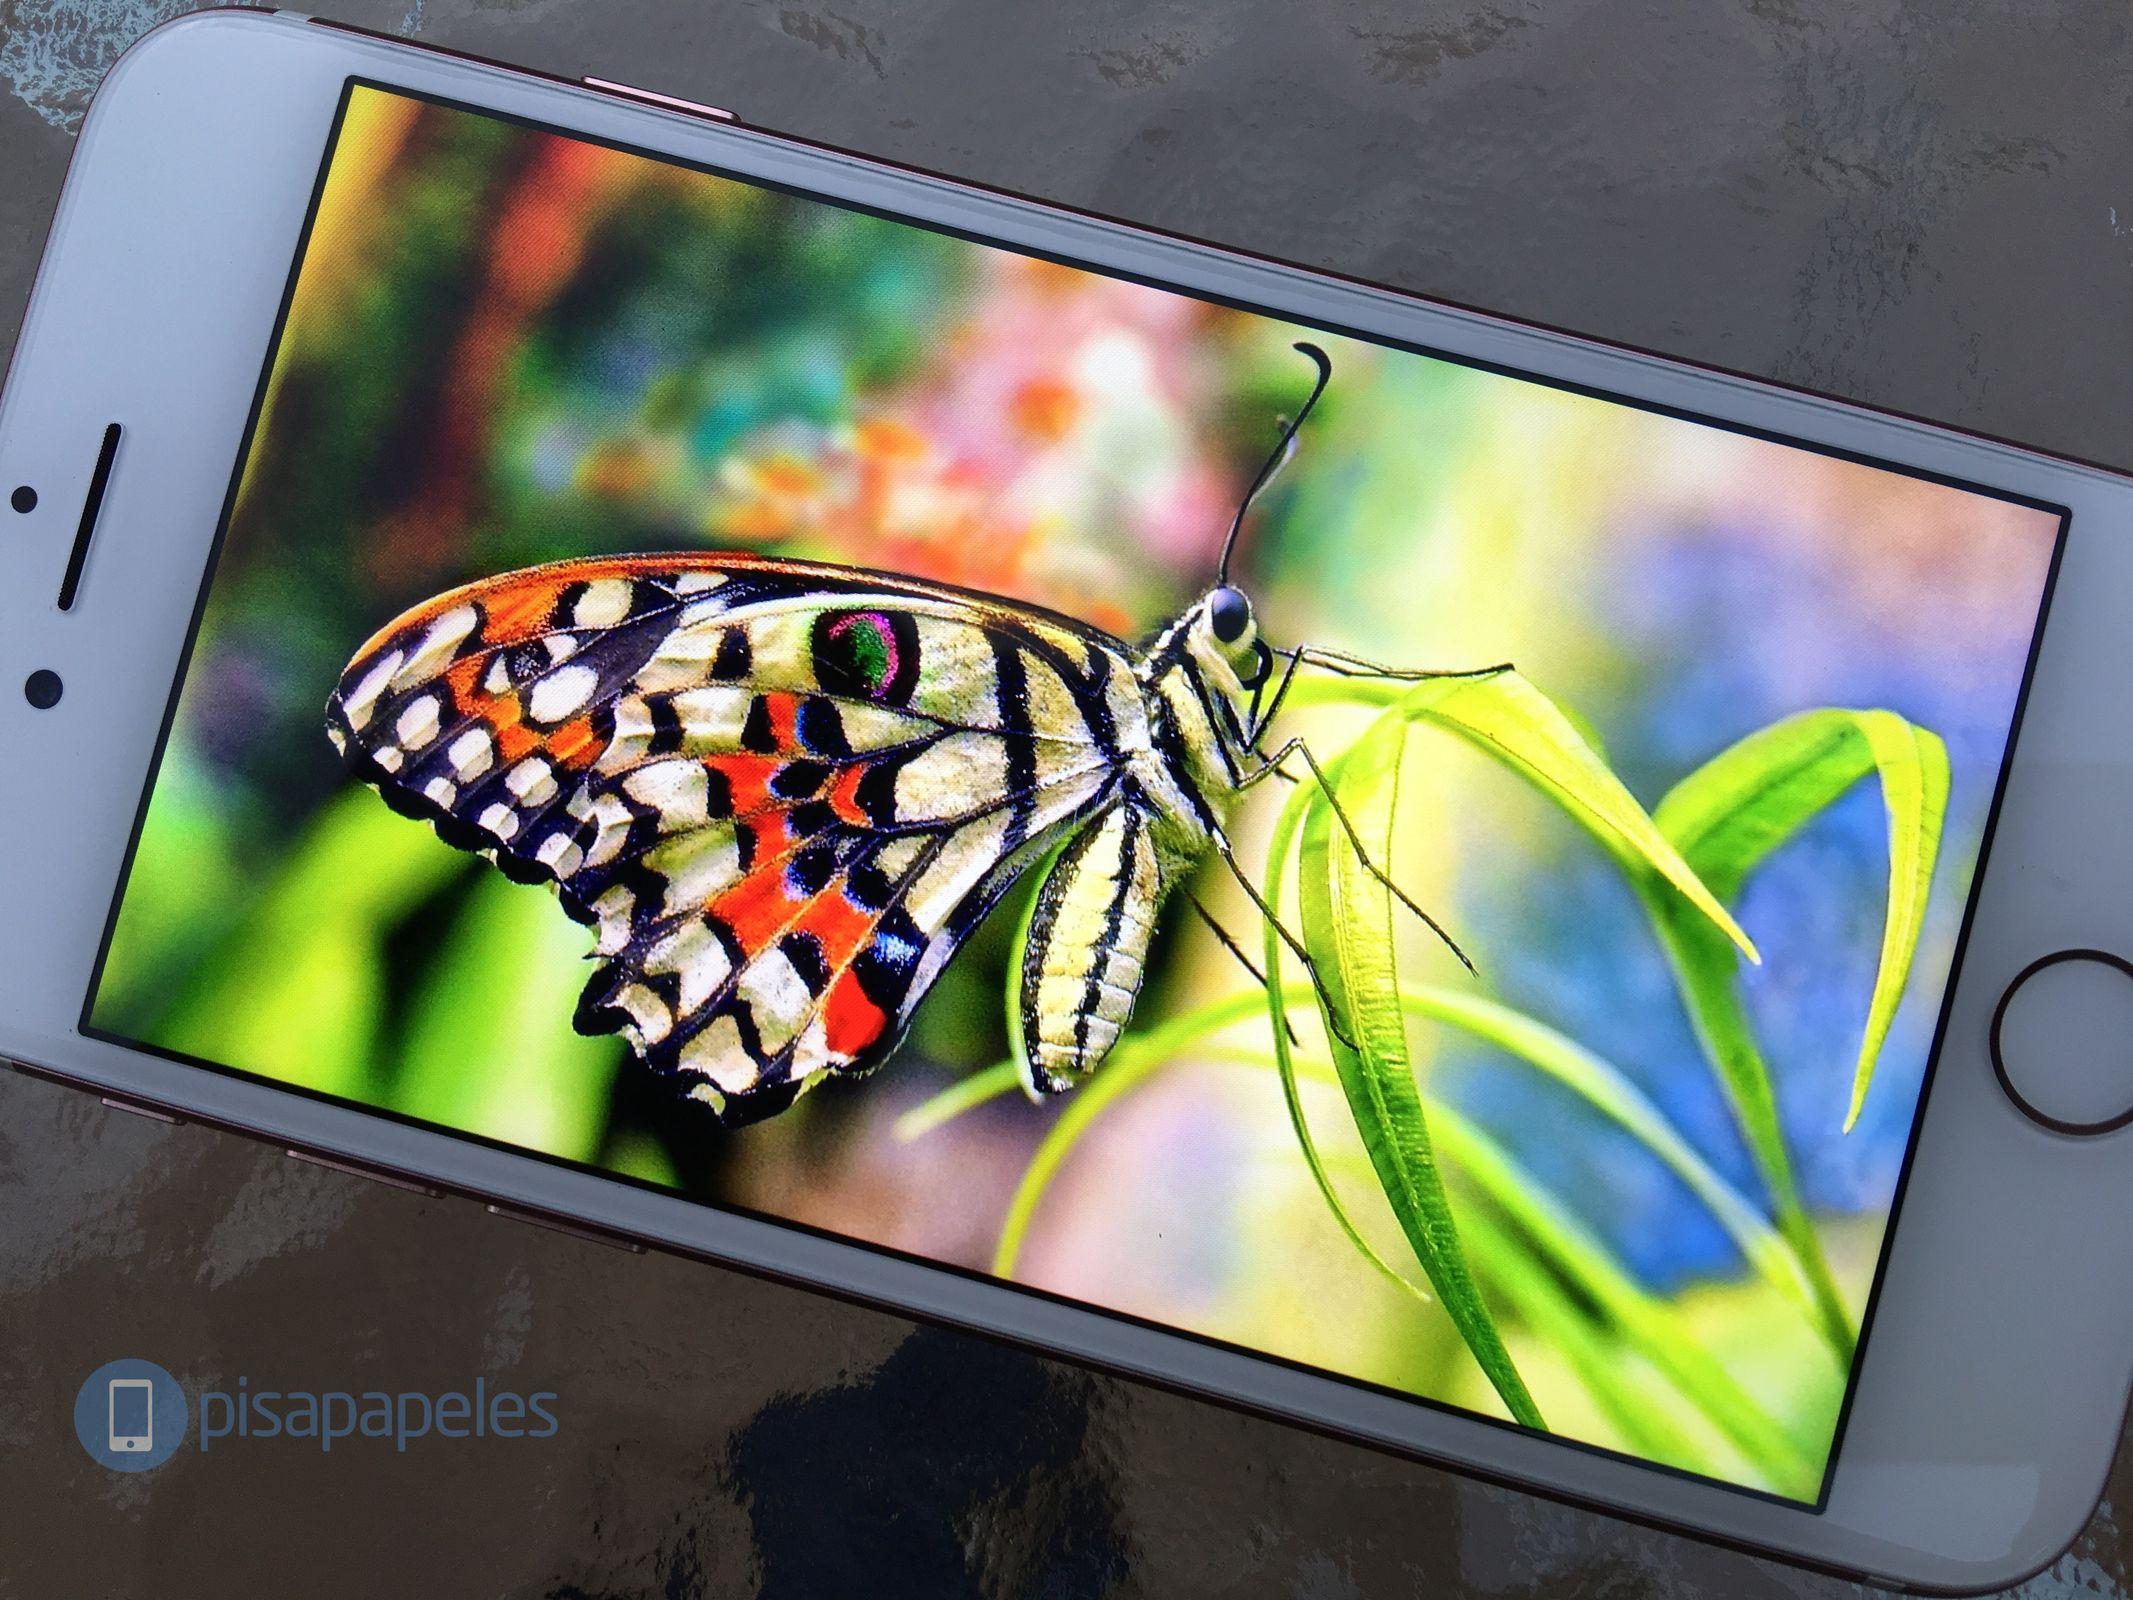 apple-iphone-7-pisapapeles-net_2